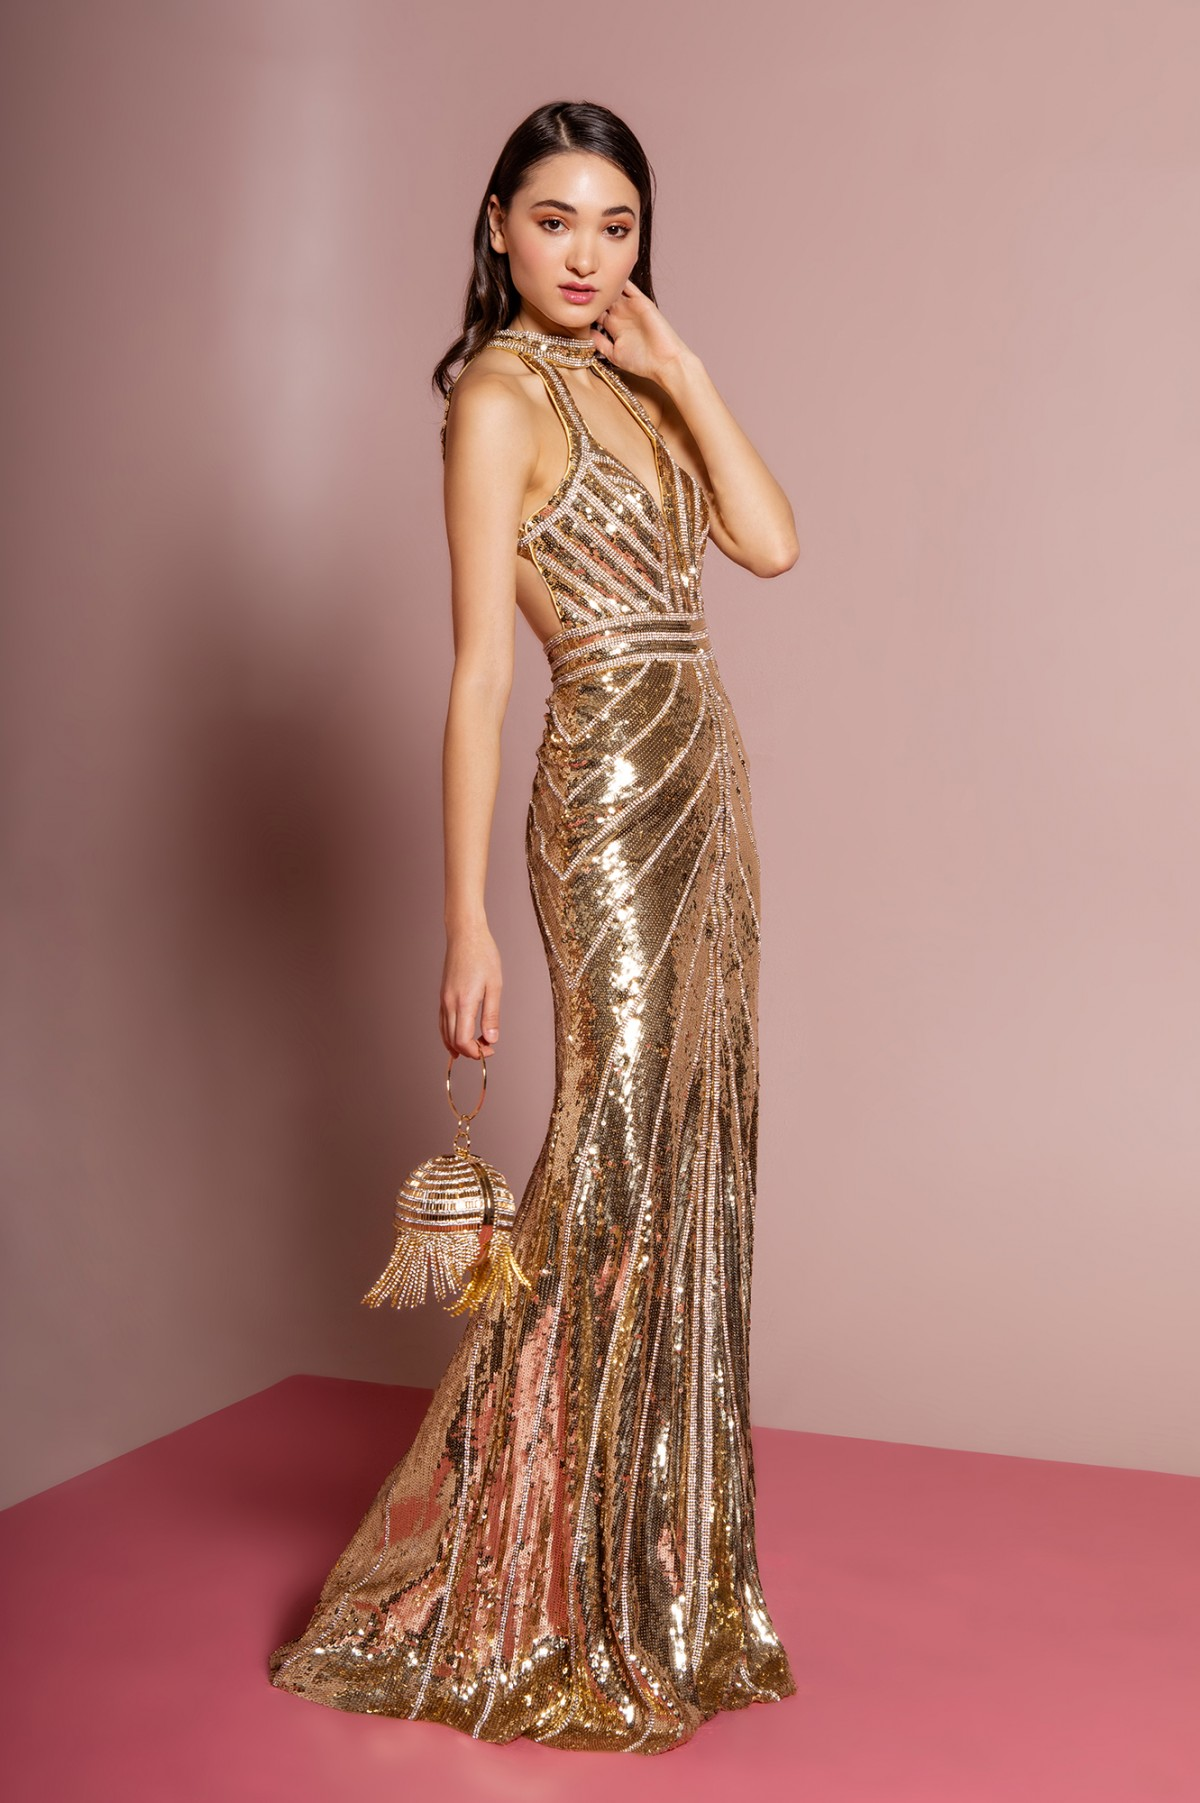 Jewel Embellished Sequin Mermaid Long Dress w/ Strap Back in Gold